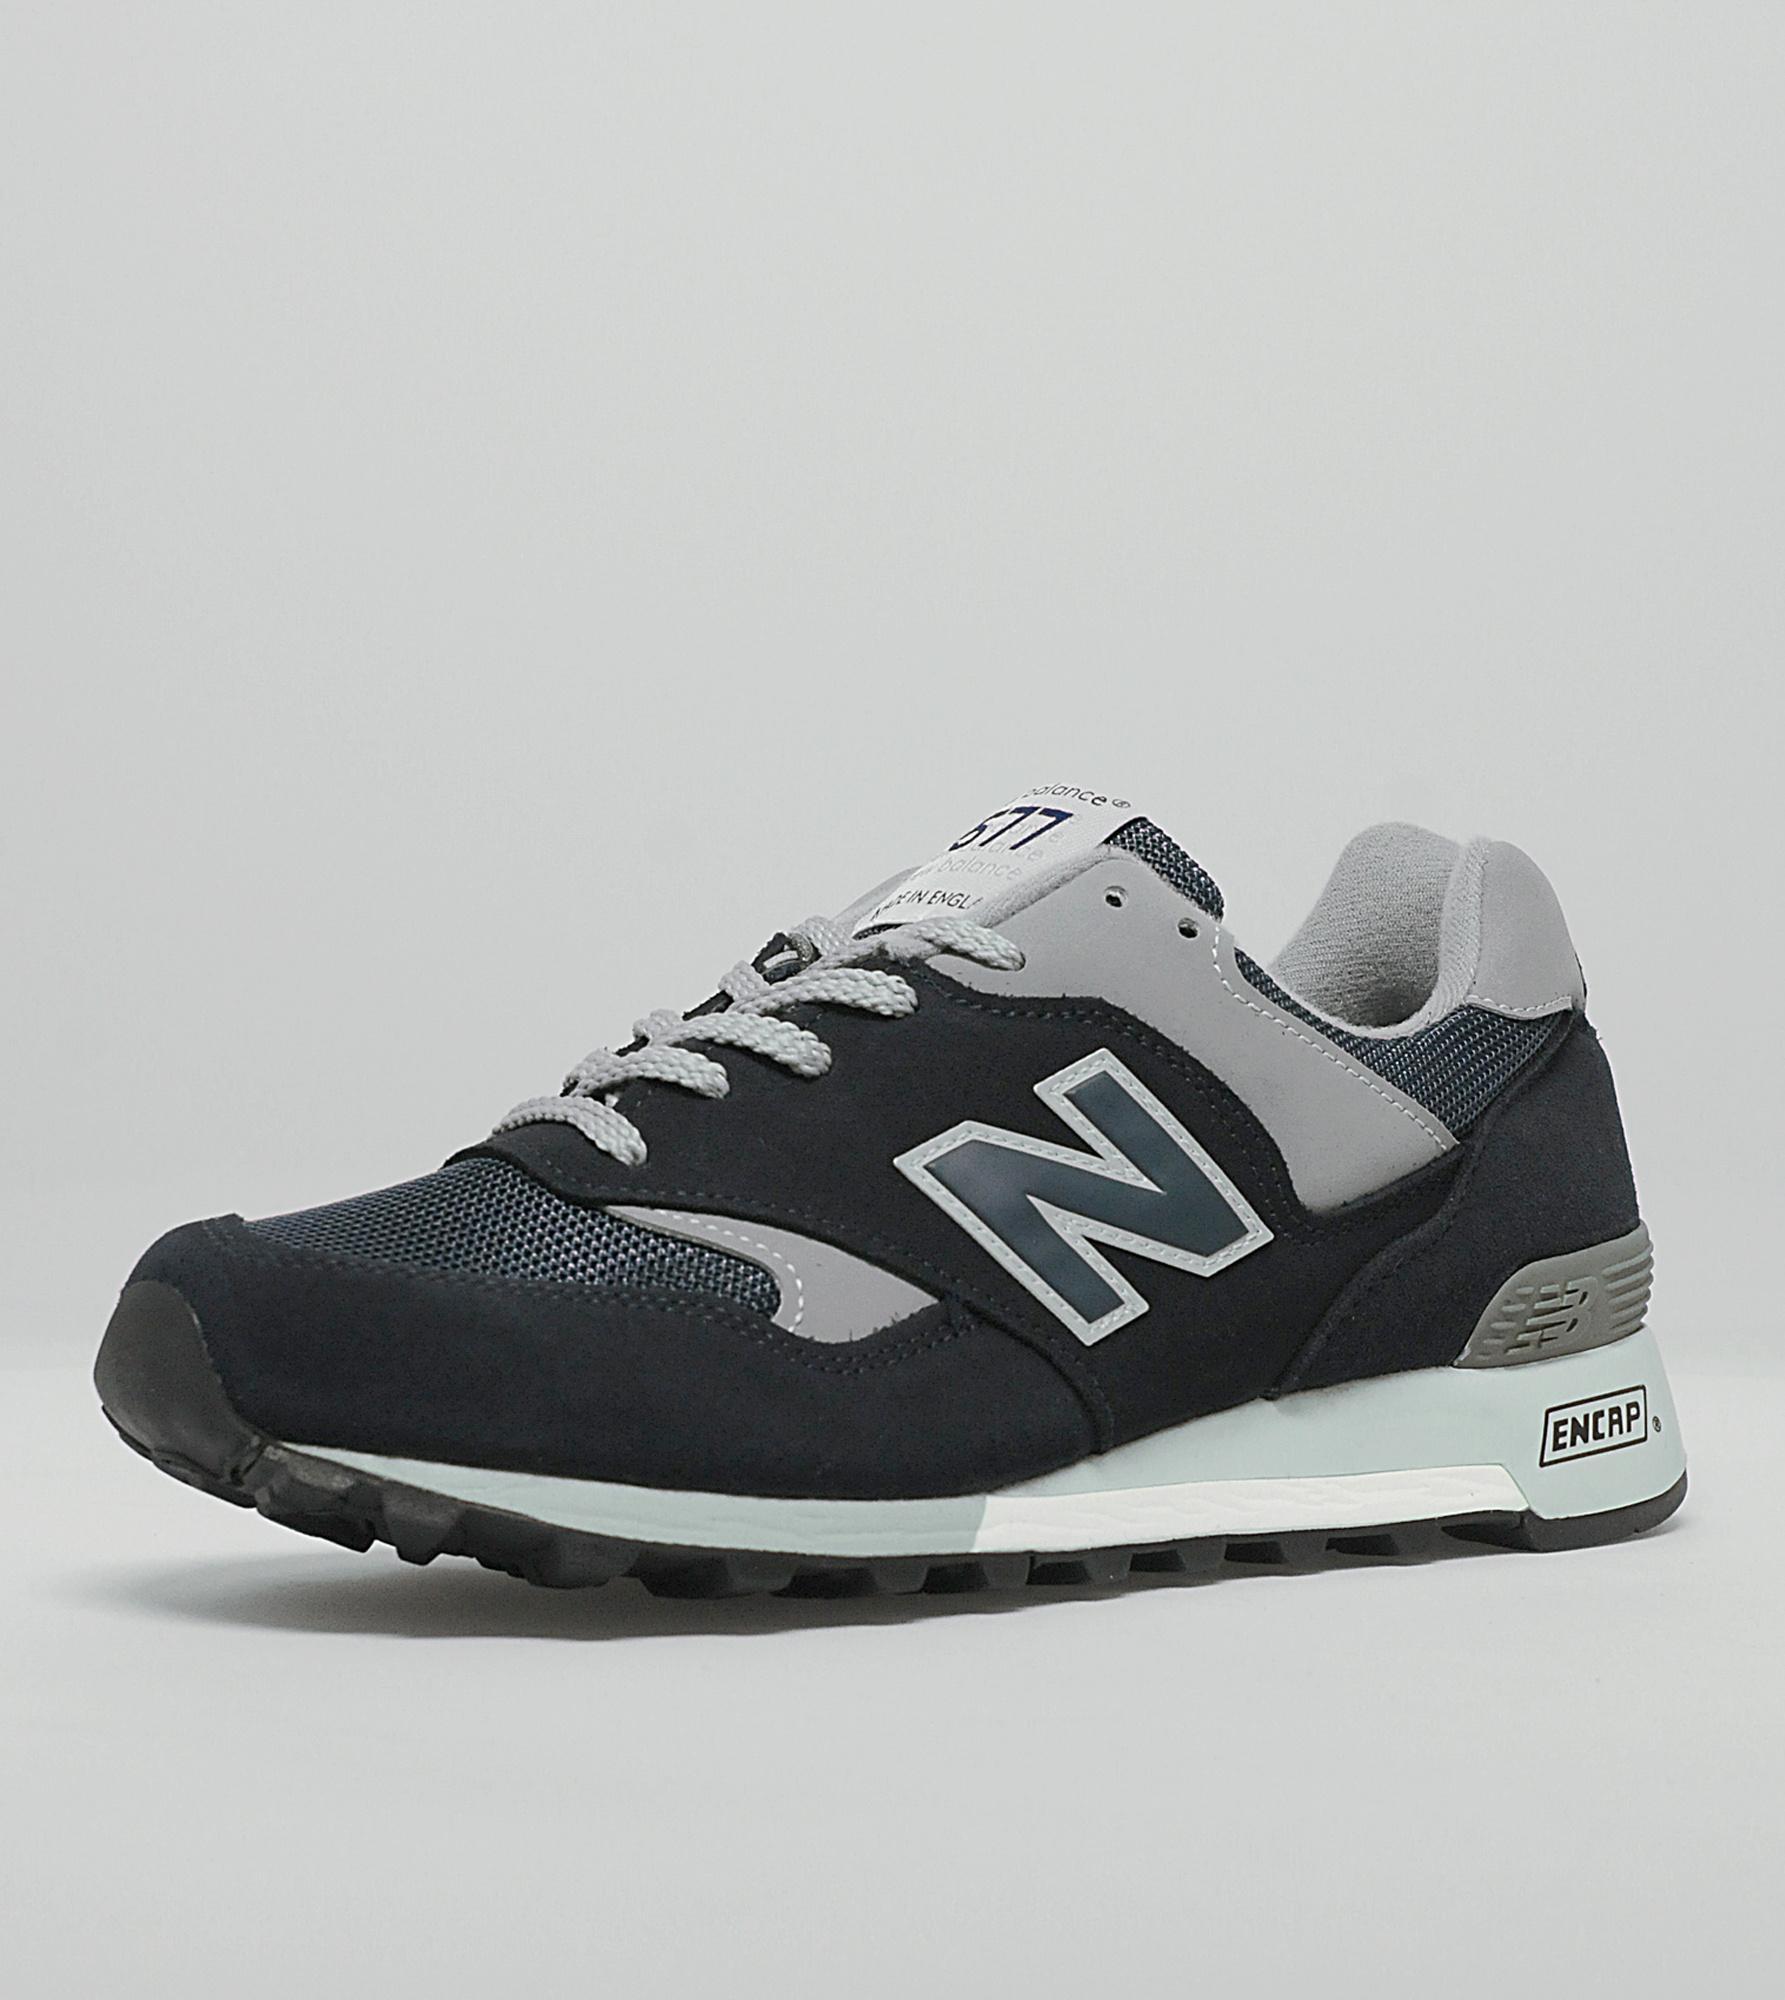 comprar new balance 577 madrid